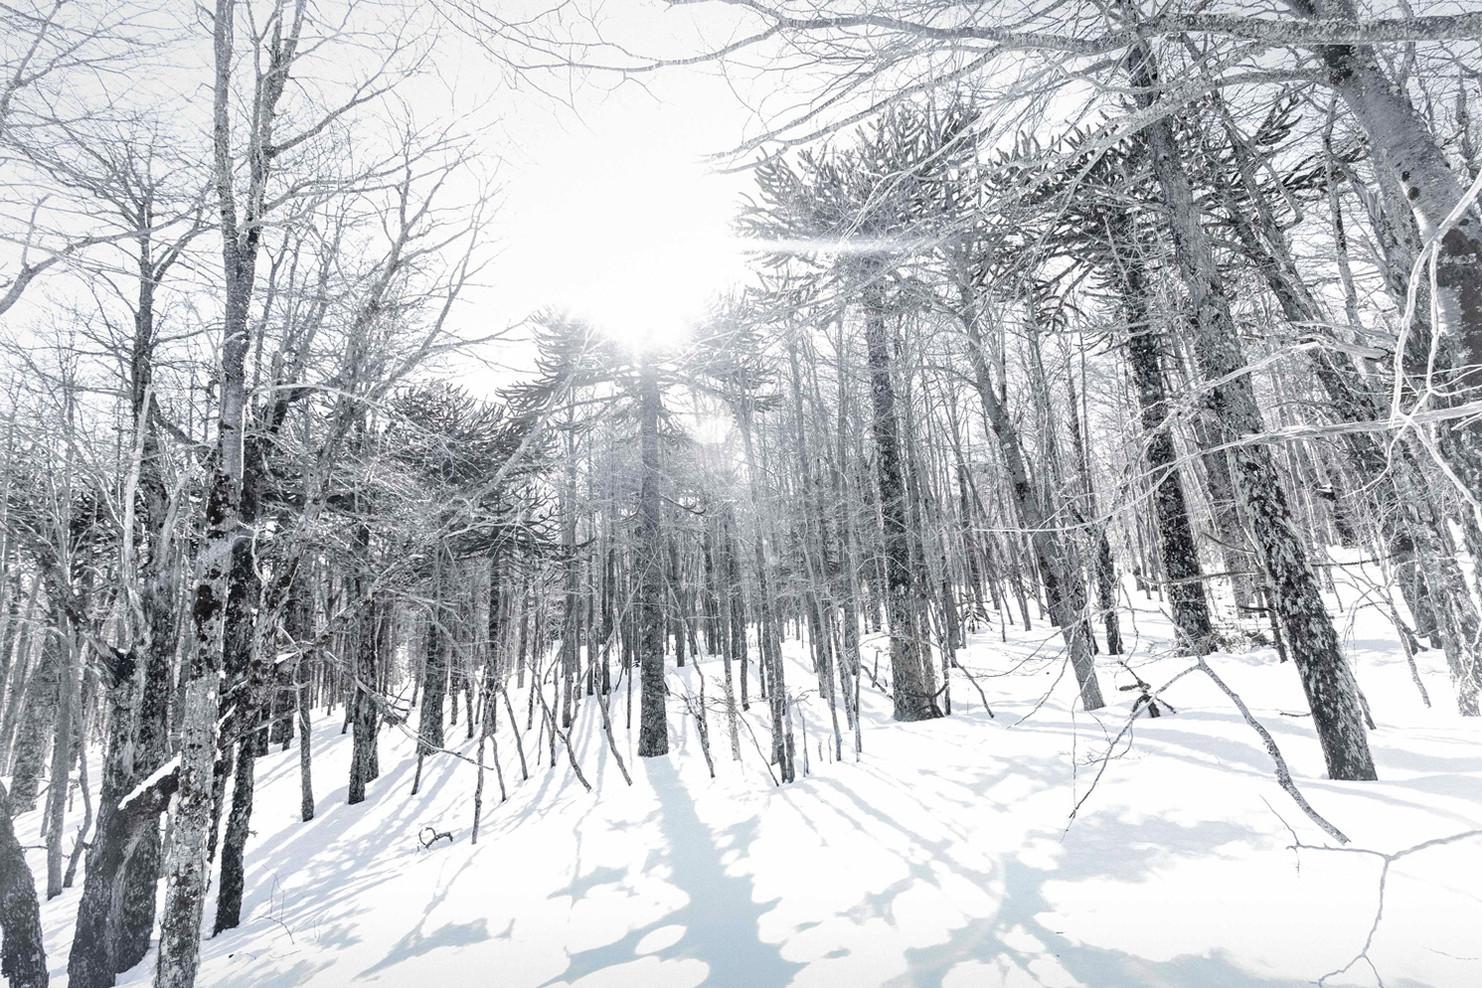 Malalcahuello Nieve & Árboles - Nature - Araucanía Chile, Snow Claudio Ramírez Landscape & Nature Photography